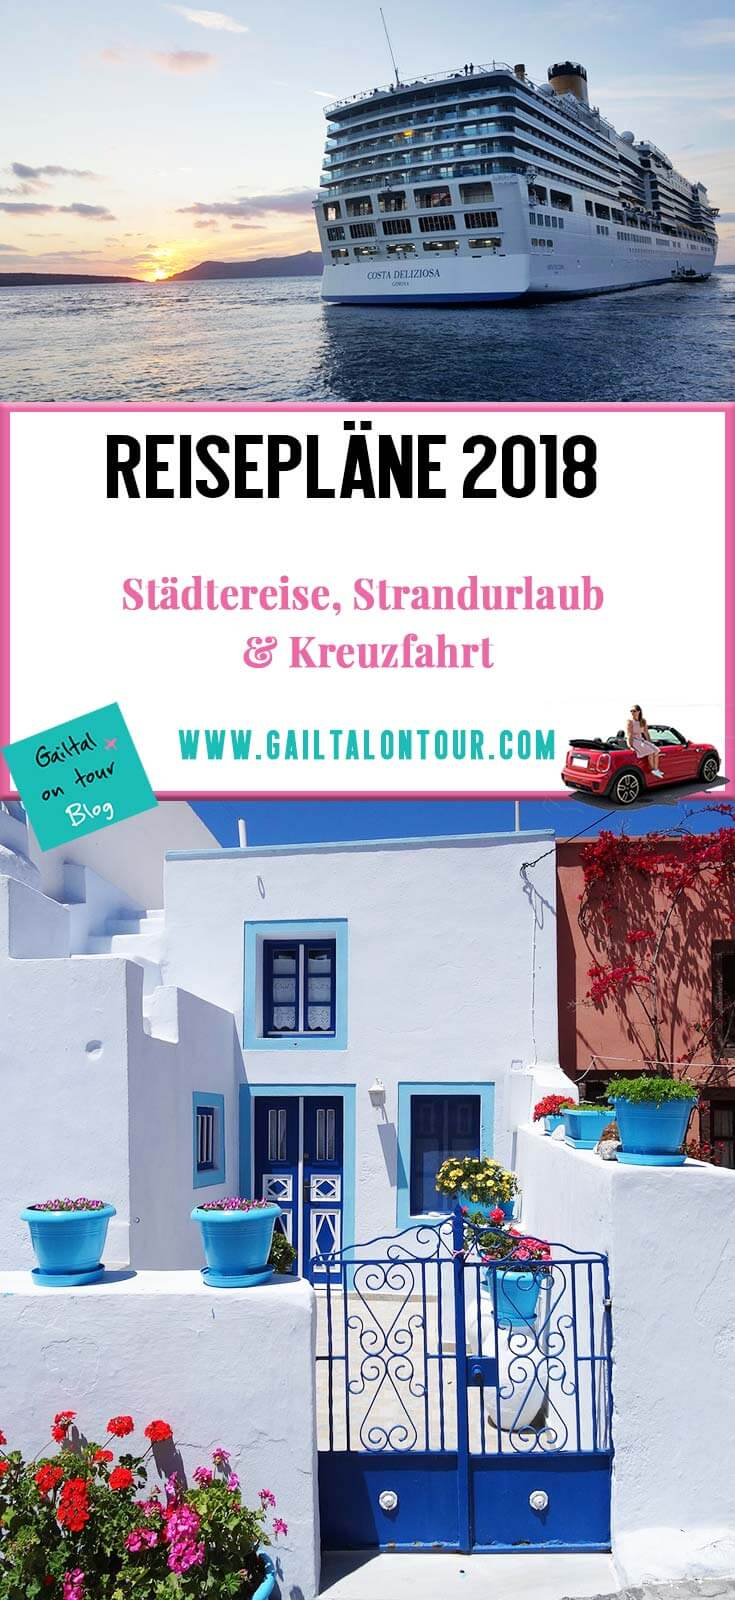 Reisepläne 2018